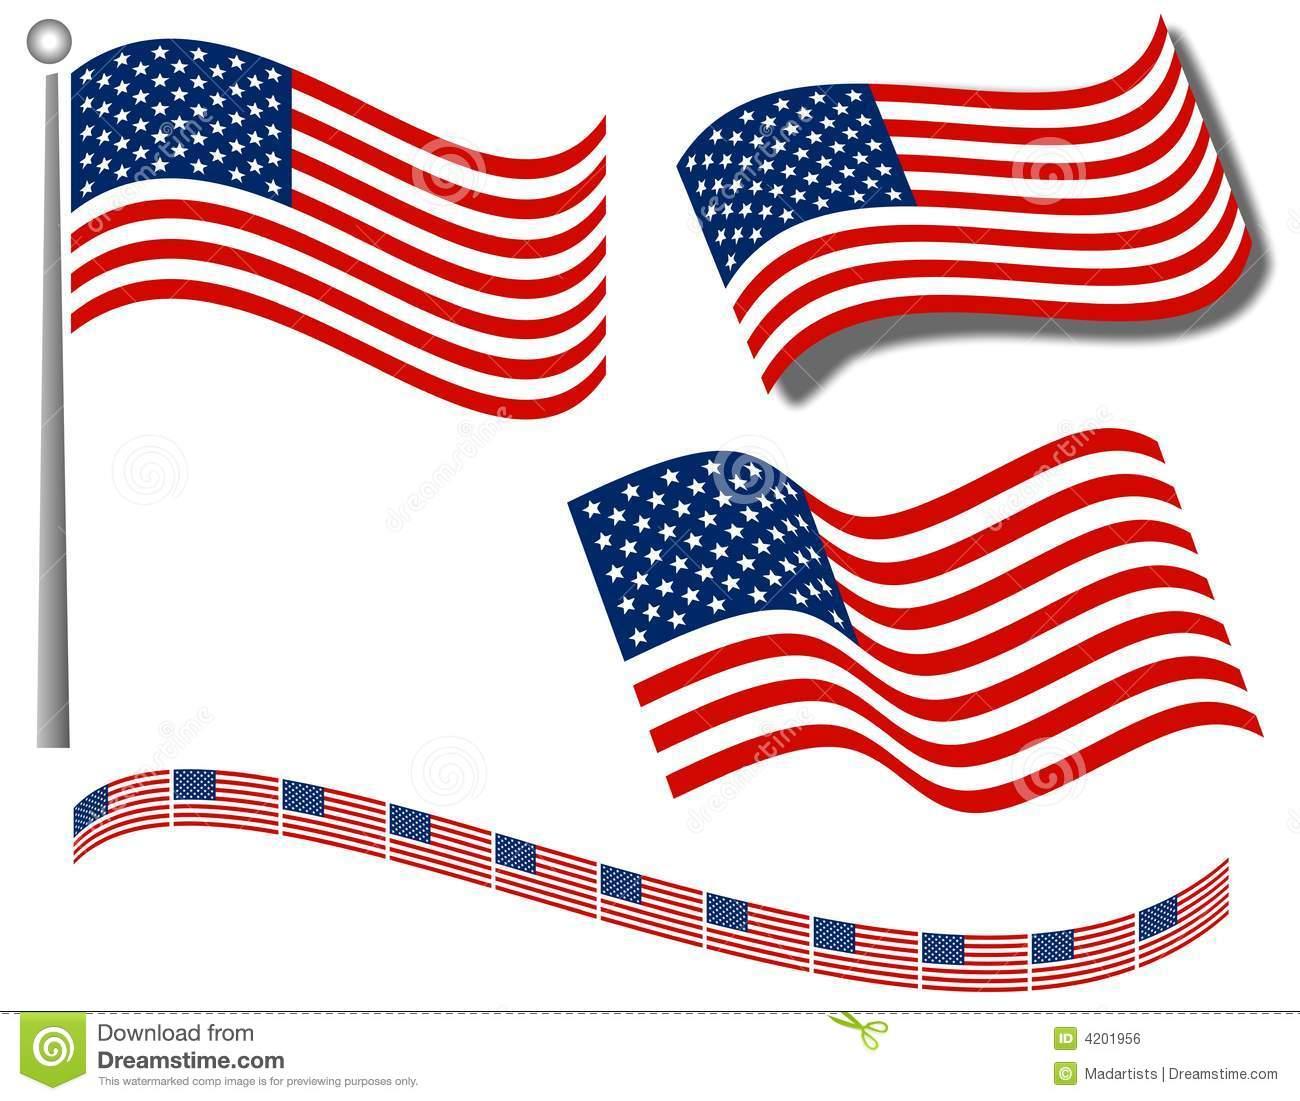 Us flag border clipart banner black and white Free clipart flags border - ClipartFest banner black and white